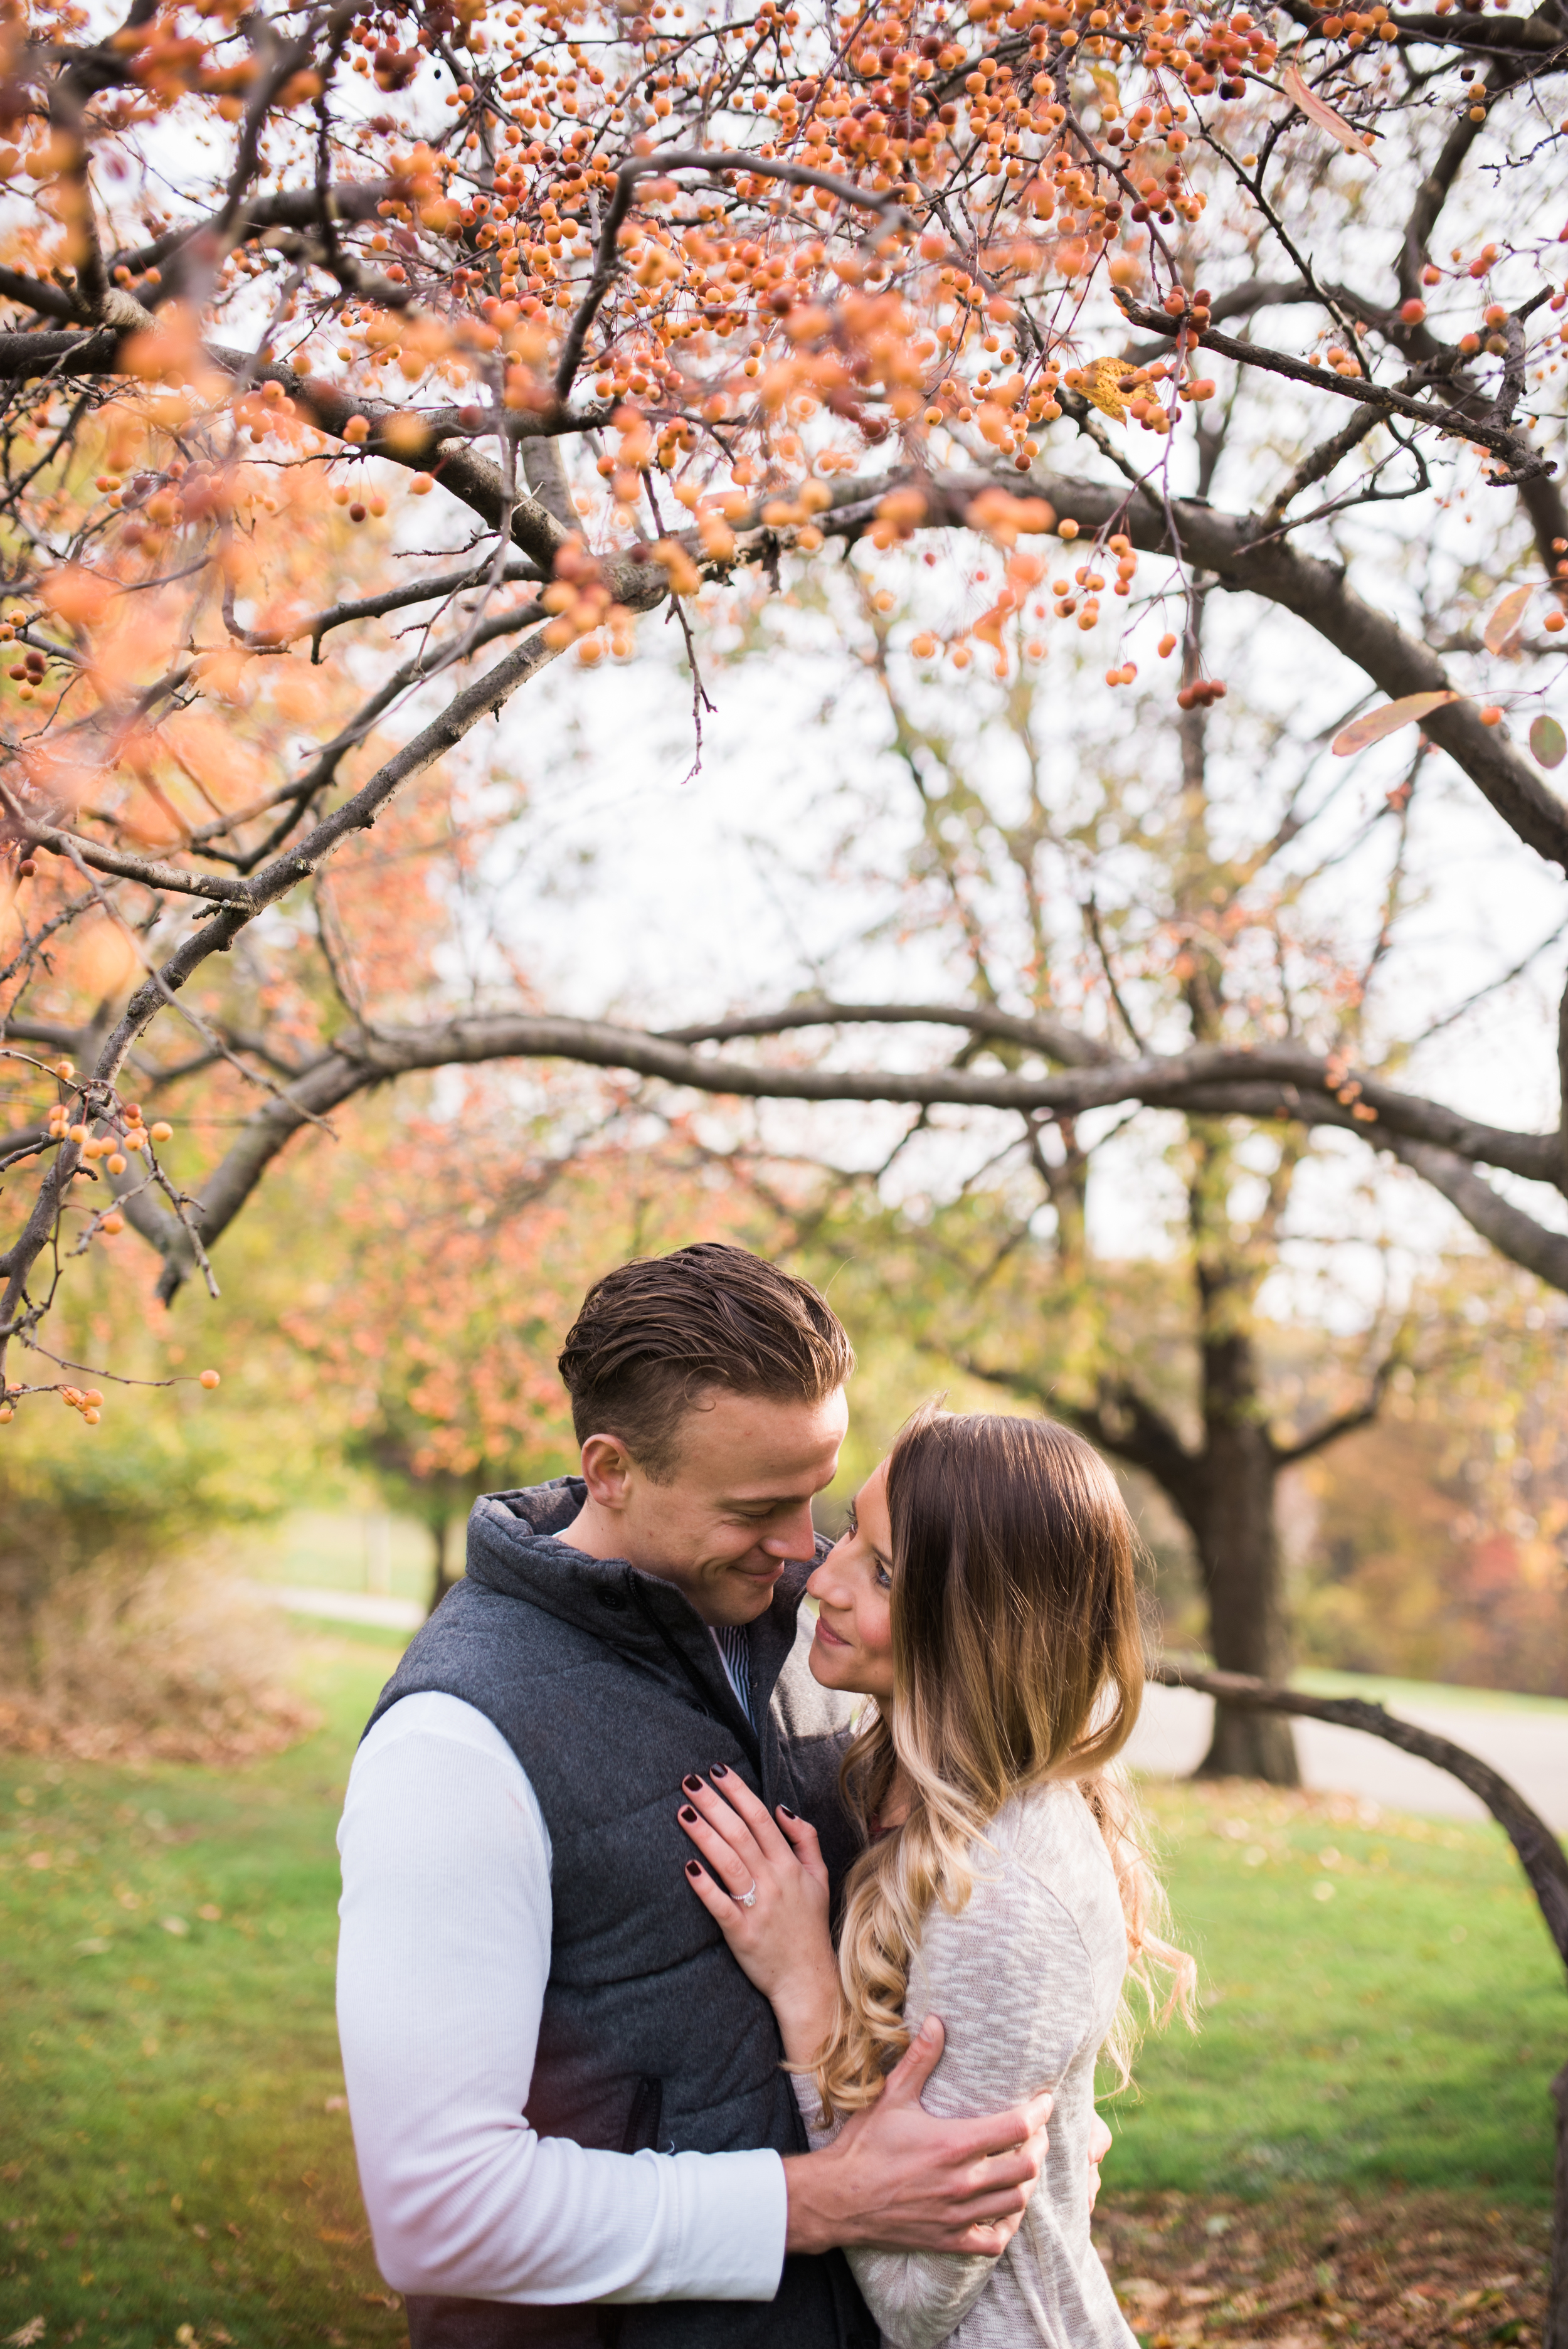 Pittsburgh engagement photographer - Pittsburgh wedding photographer - Hartwood Acres Image 15